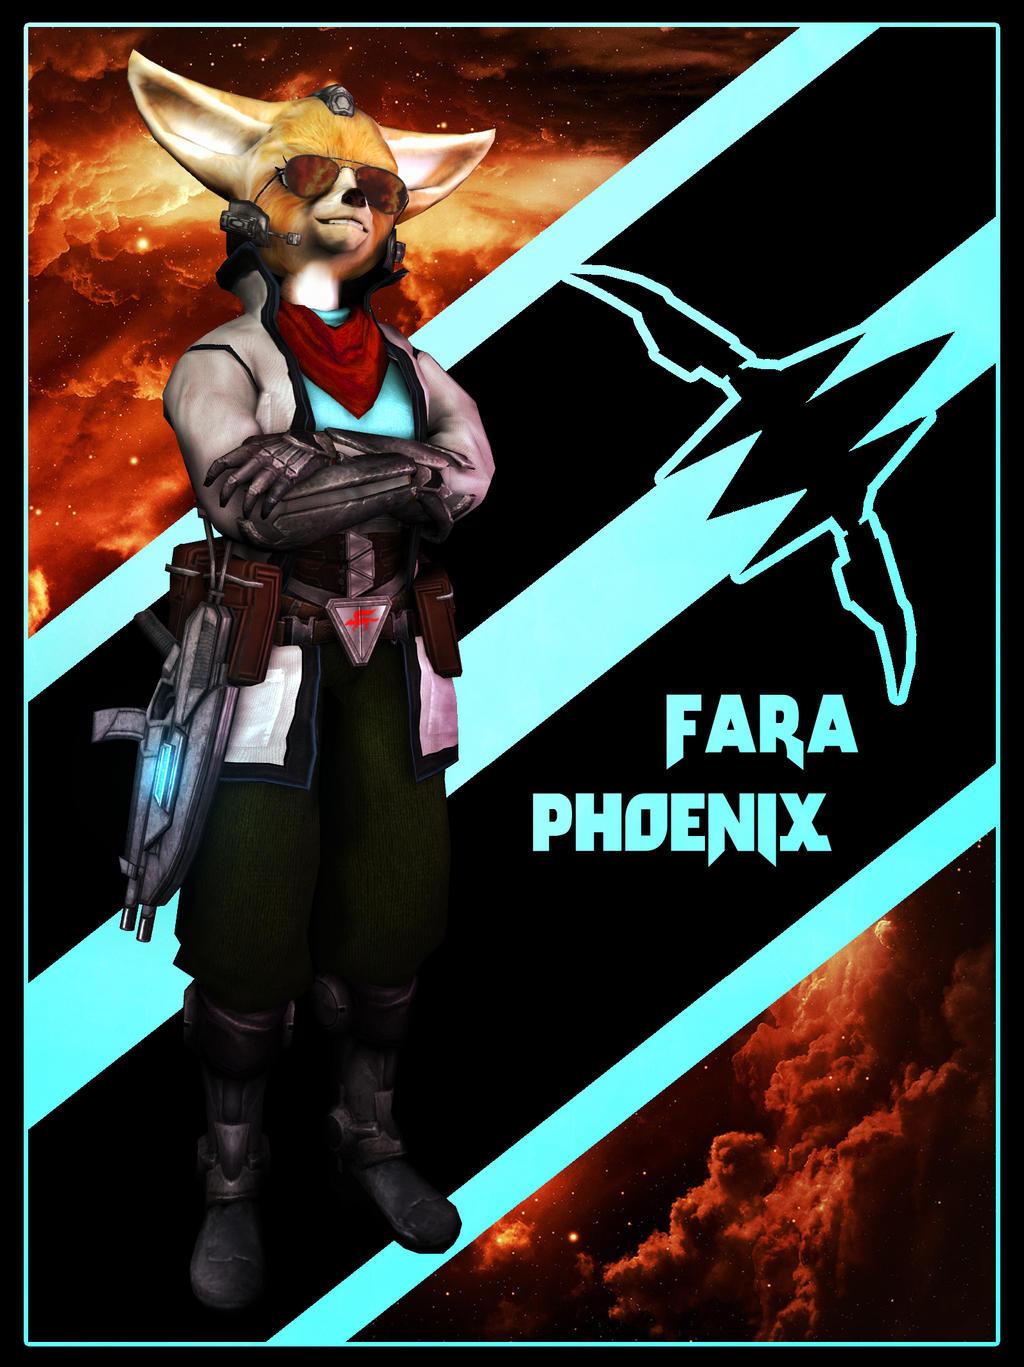 fara_phoenix_by_undyingnephalim-d8nwk6h.